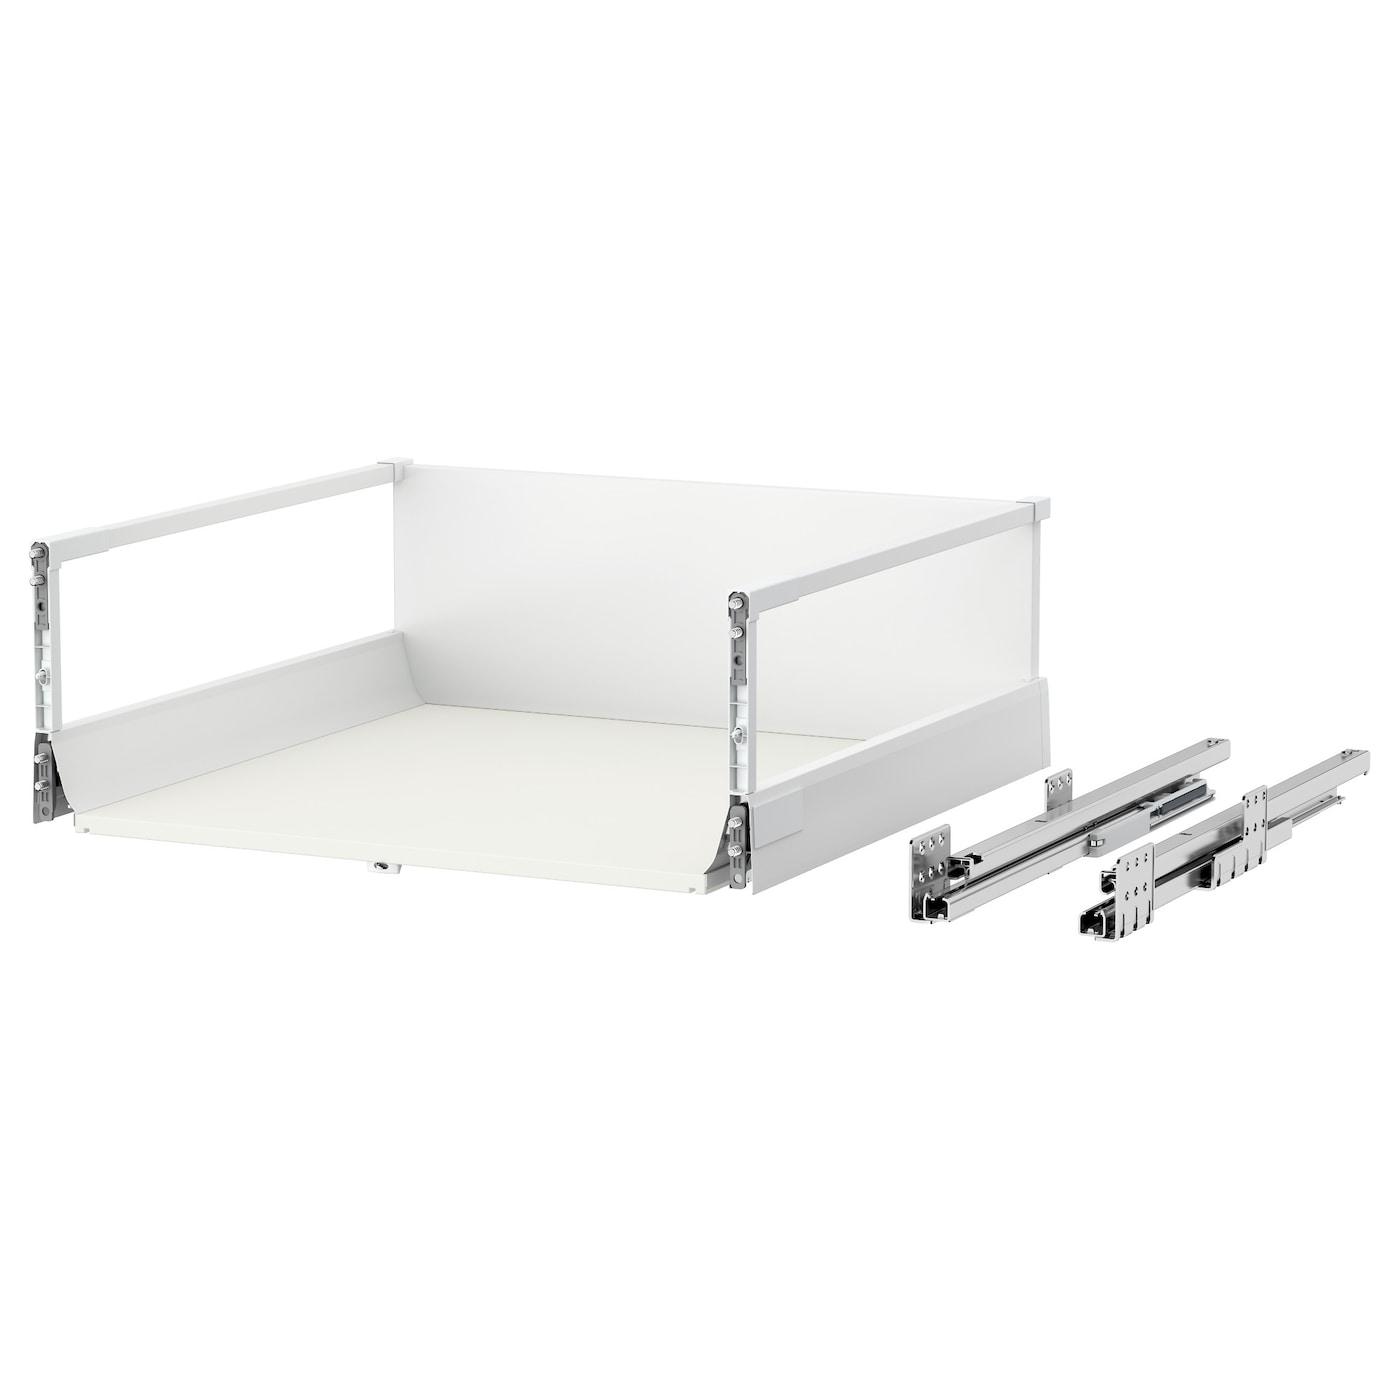 maximera tiroir haut blanc 60x60 cm ikea. Black Bedroom Furniture Sets. Home Design Ideas